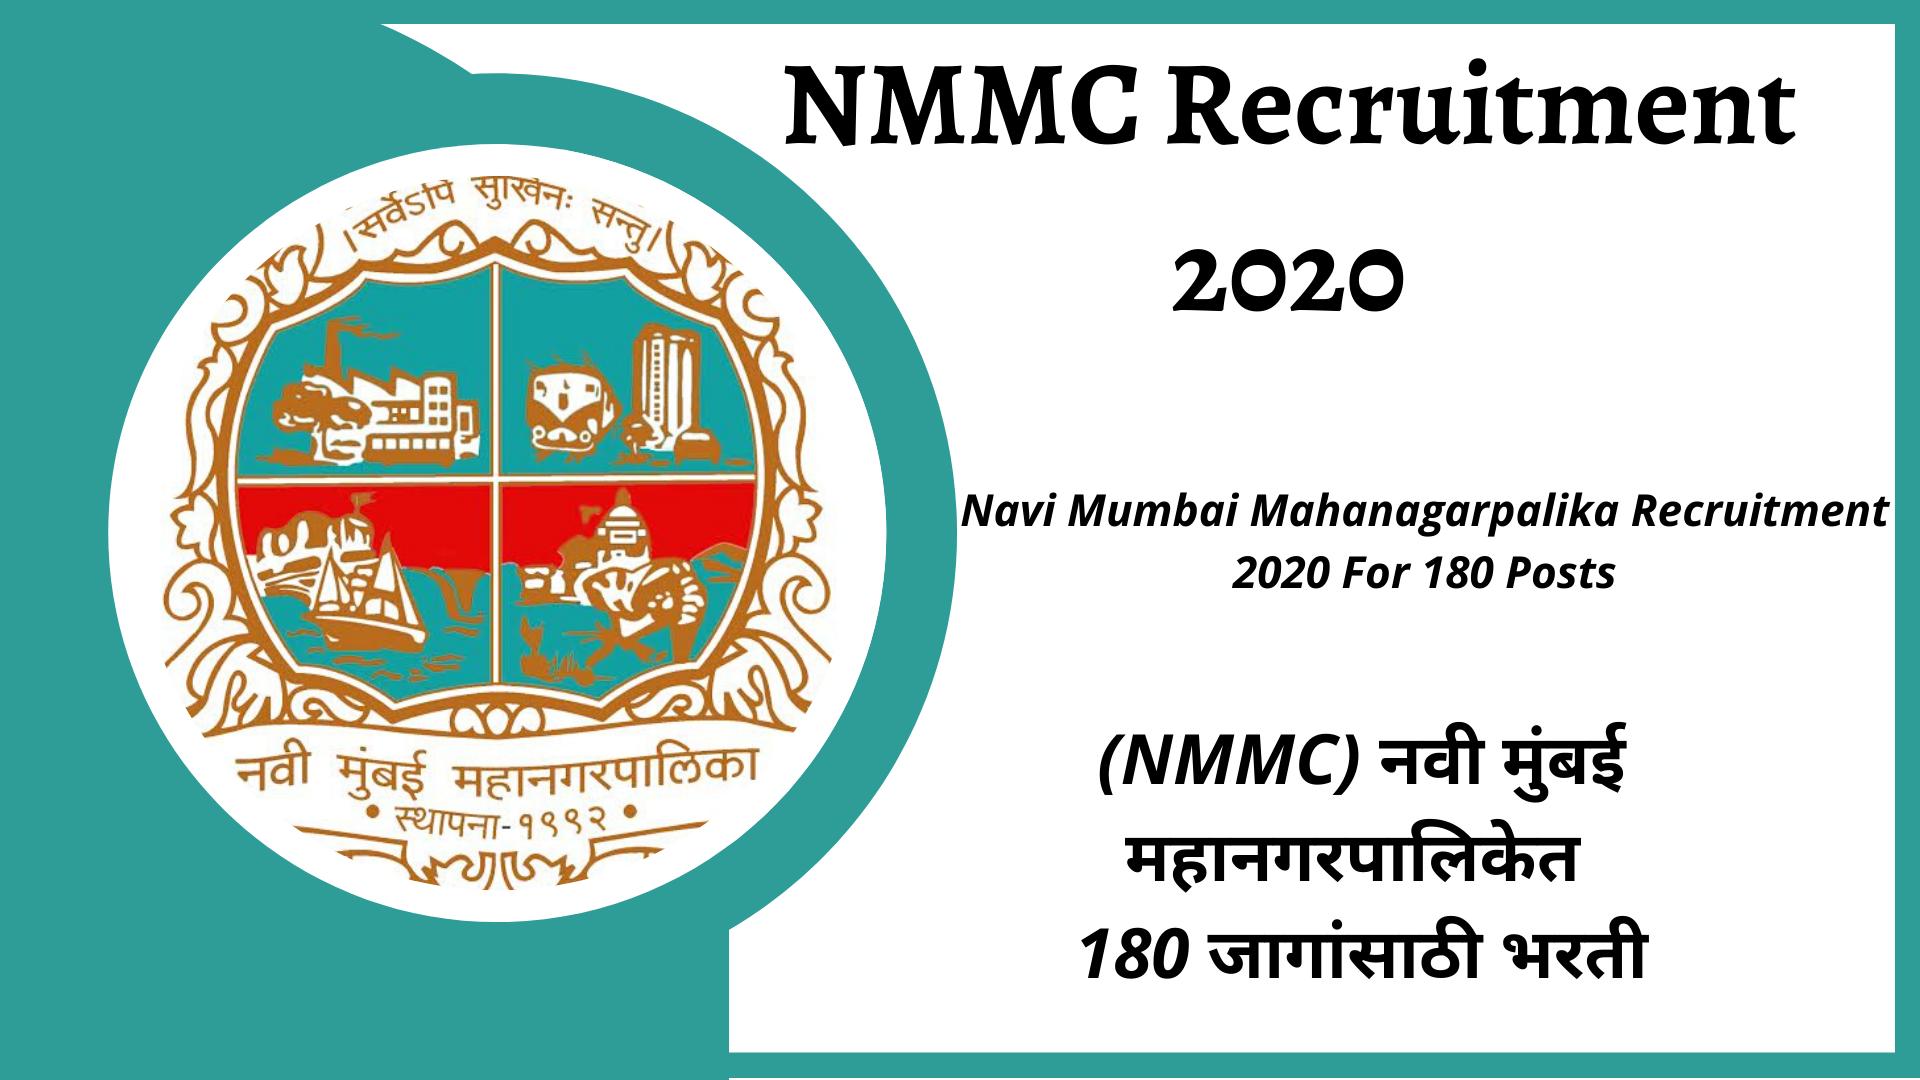 NMMC Recruitment 2020